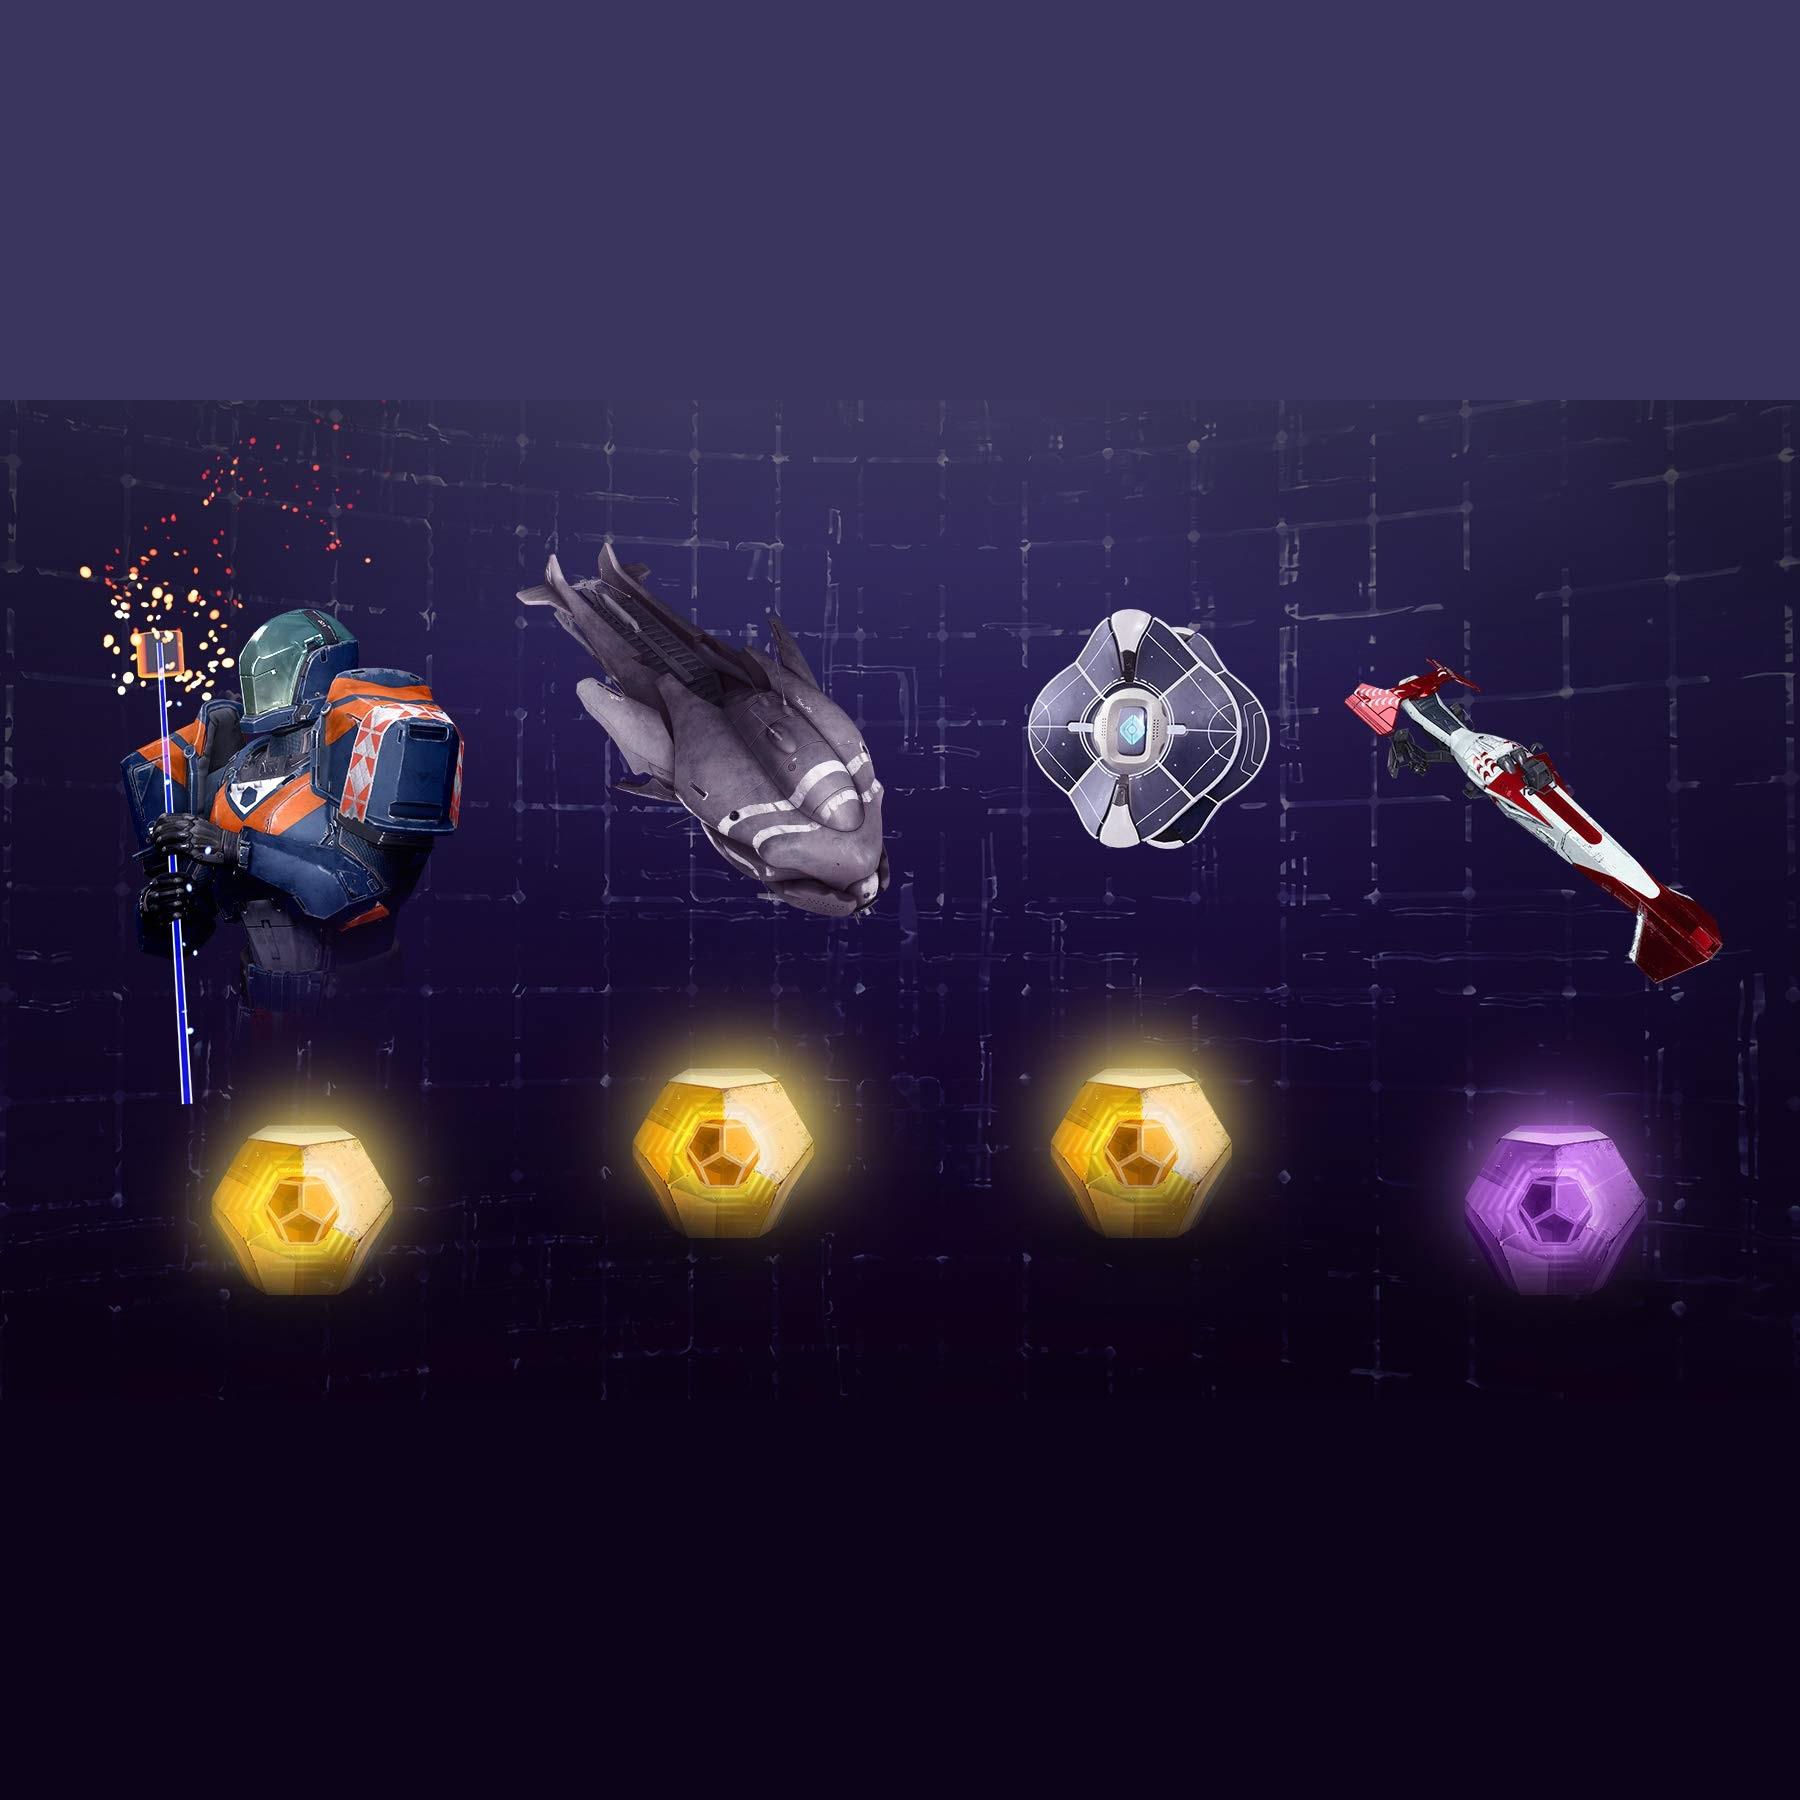 Destiny 2: S'Mores Emote Exotic Bundle inkl. Emote, Geist-Hülle, Vehikel-Skin und Schiff (4/6)   Twitch Prime (PC, PS4, XBOX, Stadia)